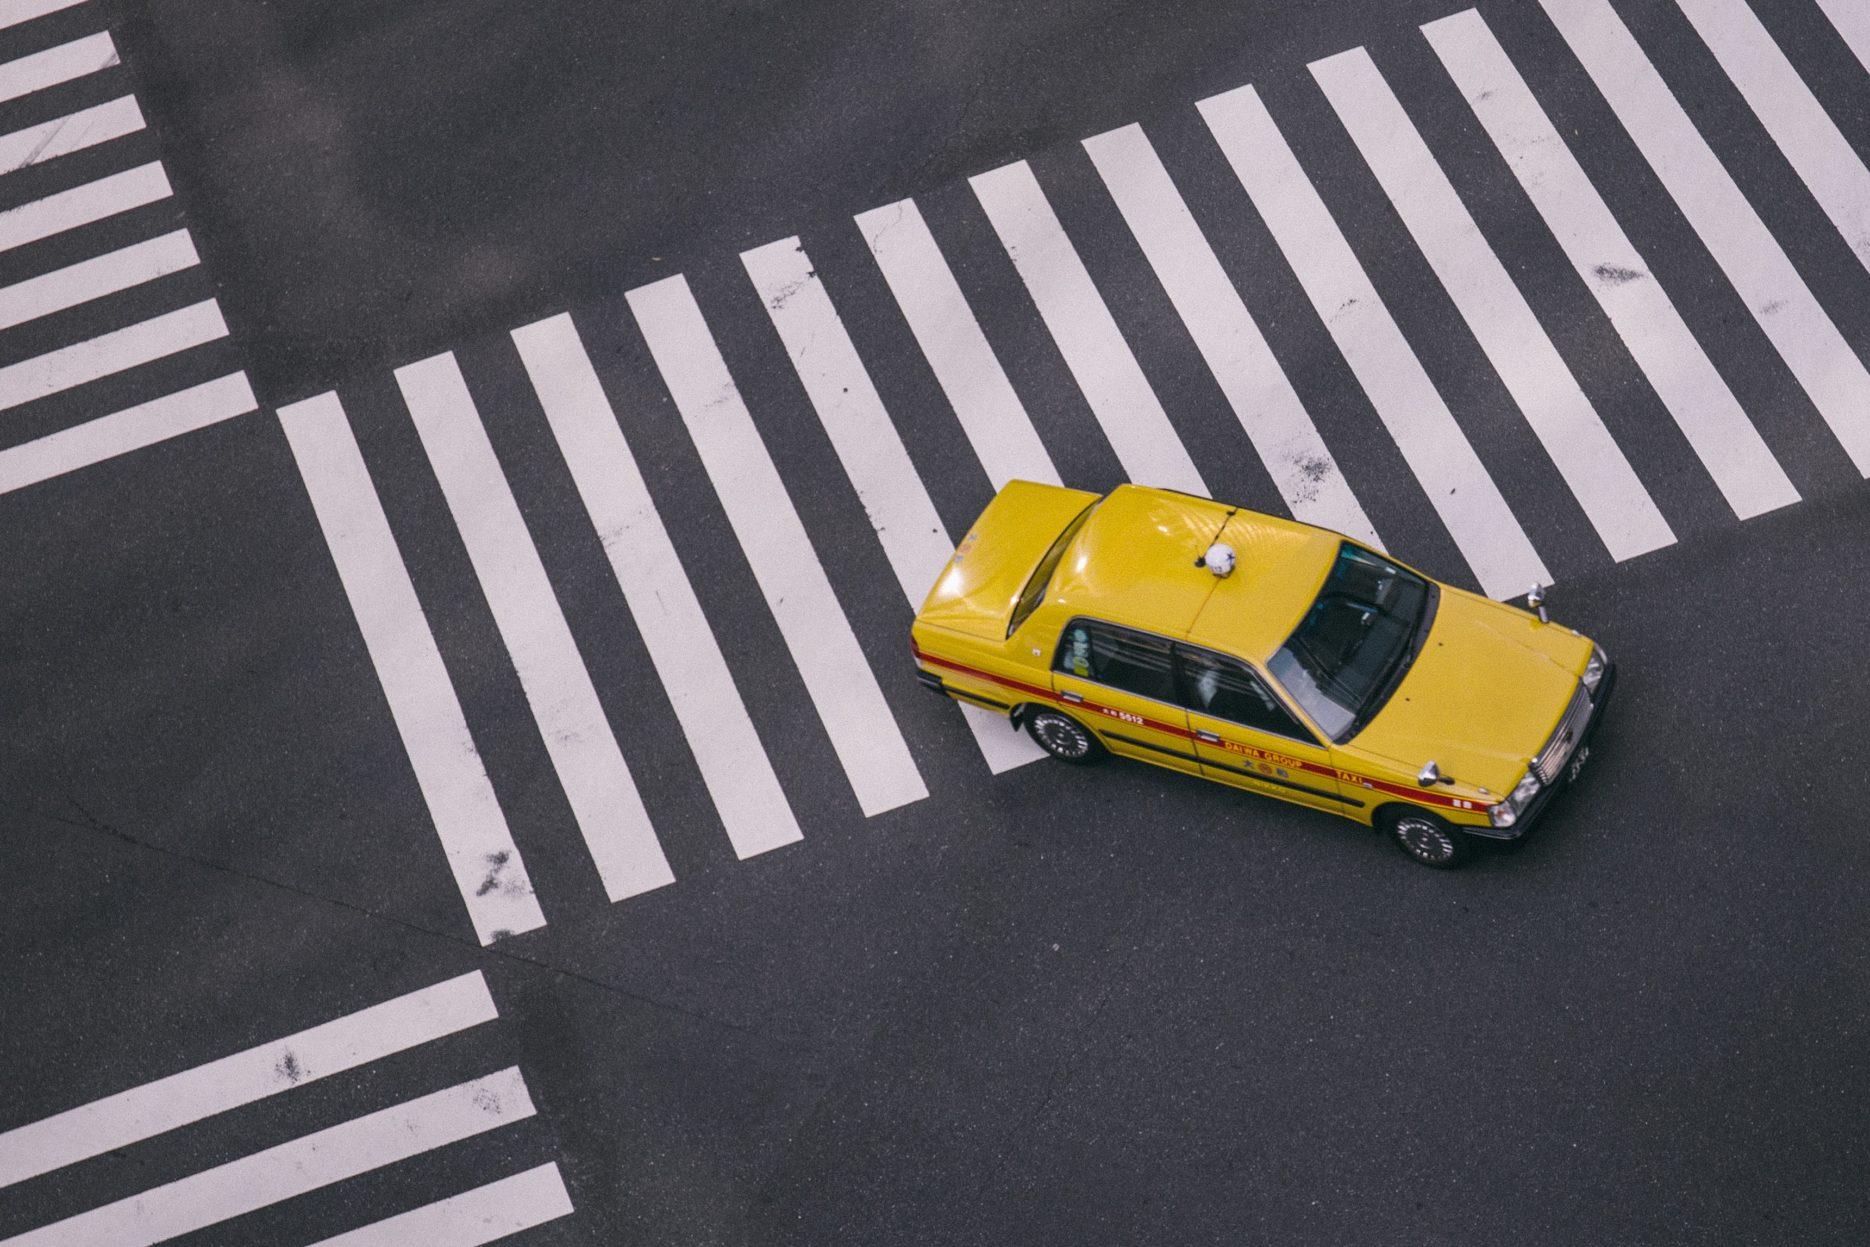 Taxi at crossroads. Credit: Unsplash